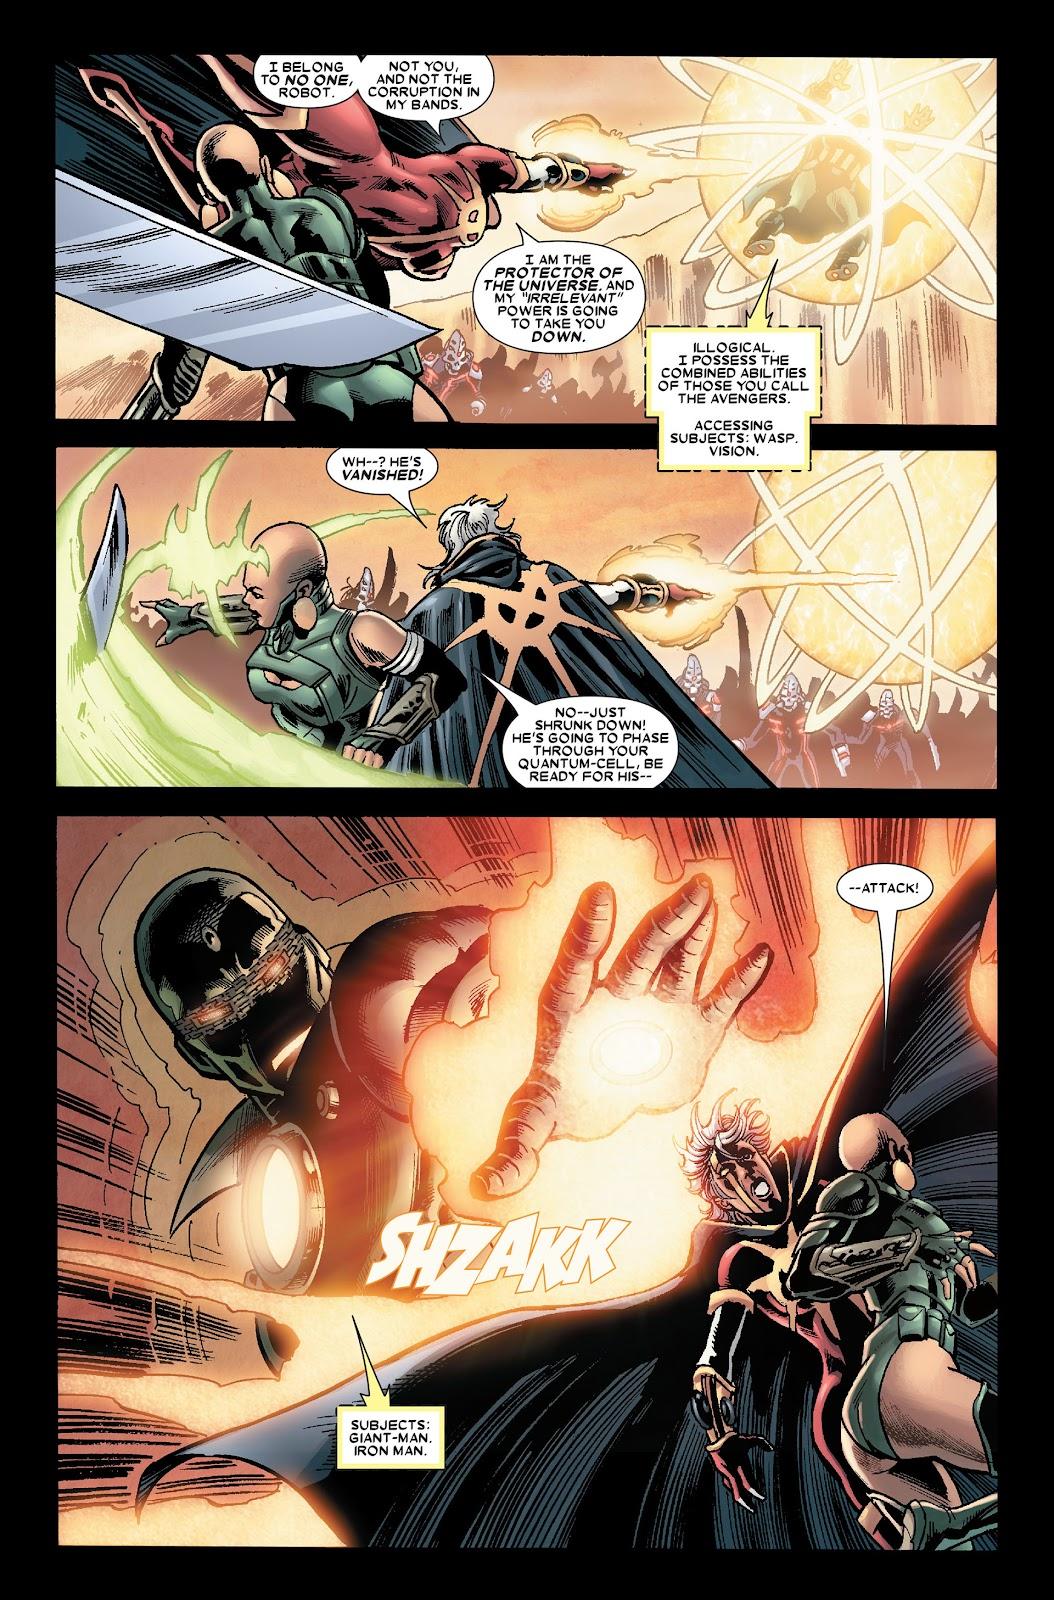 Annihilation: Conquest - Quasar issue 2 - Page 18